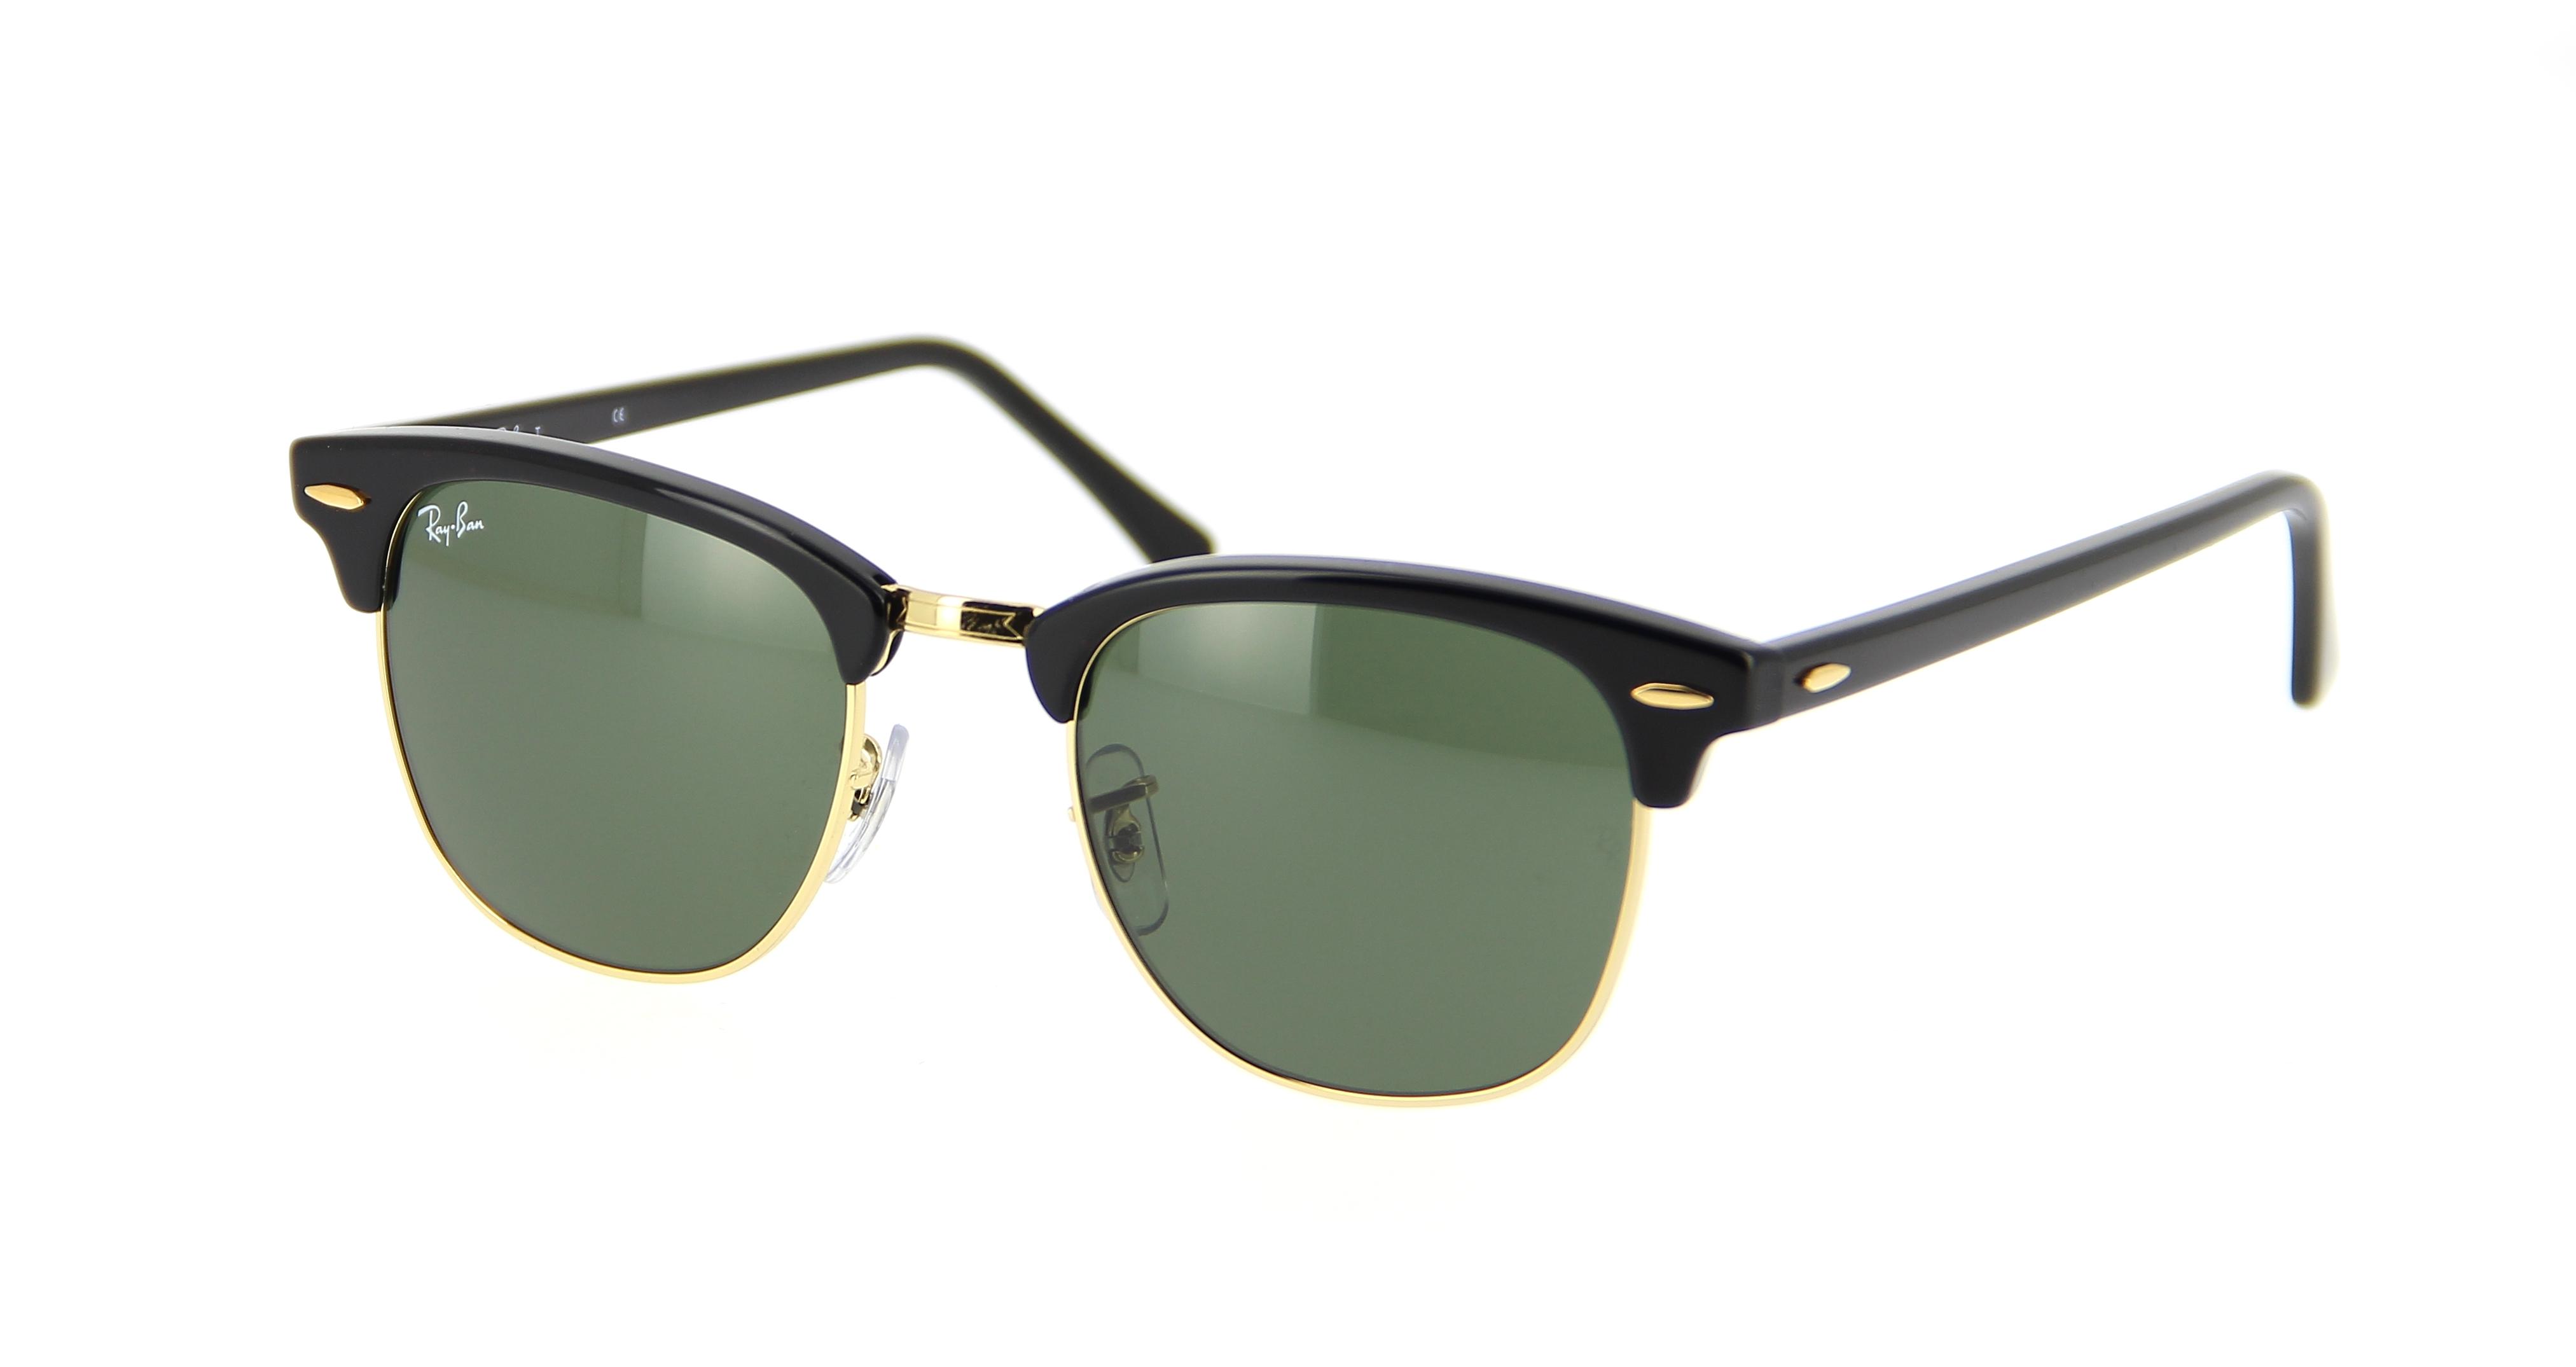 2b8e5ec4217 Ray Ban Sunglasses Style Rb 4061